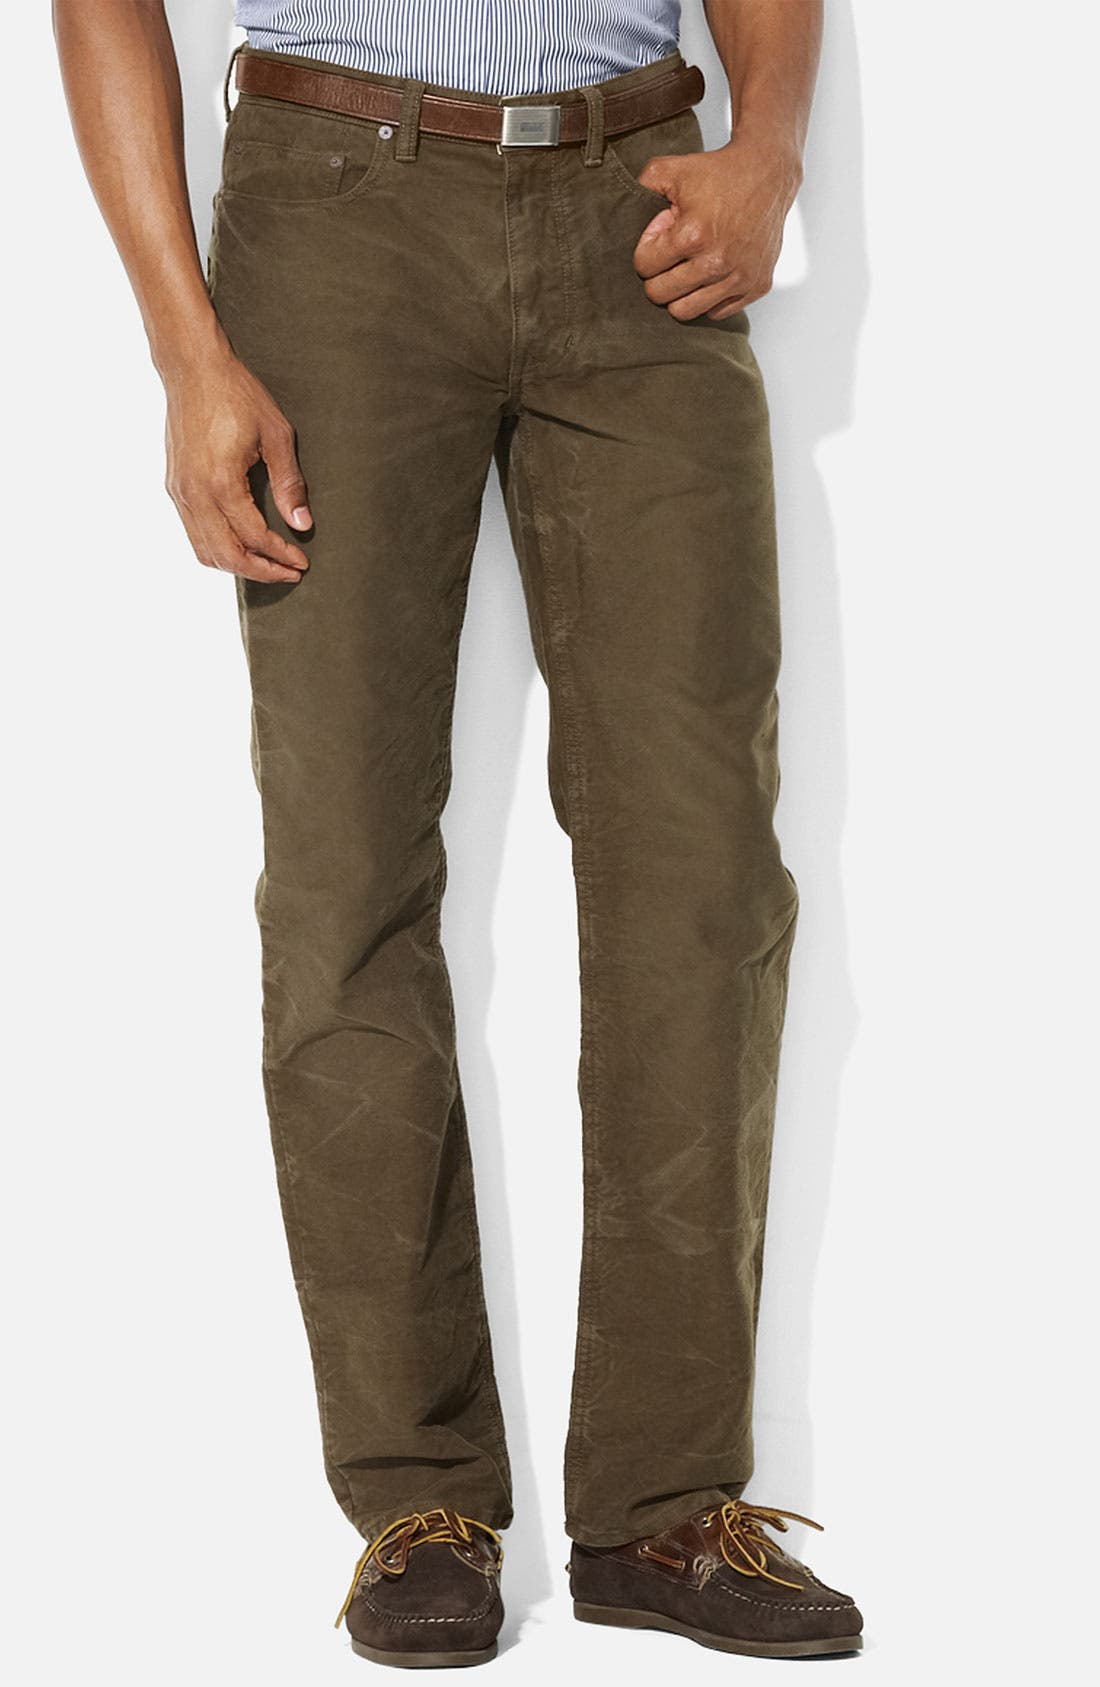 Alternate Image 1 Selected - Polo Ralph Lauren Straight Leg Moleskin Cotton Pants